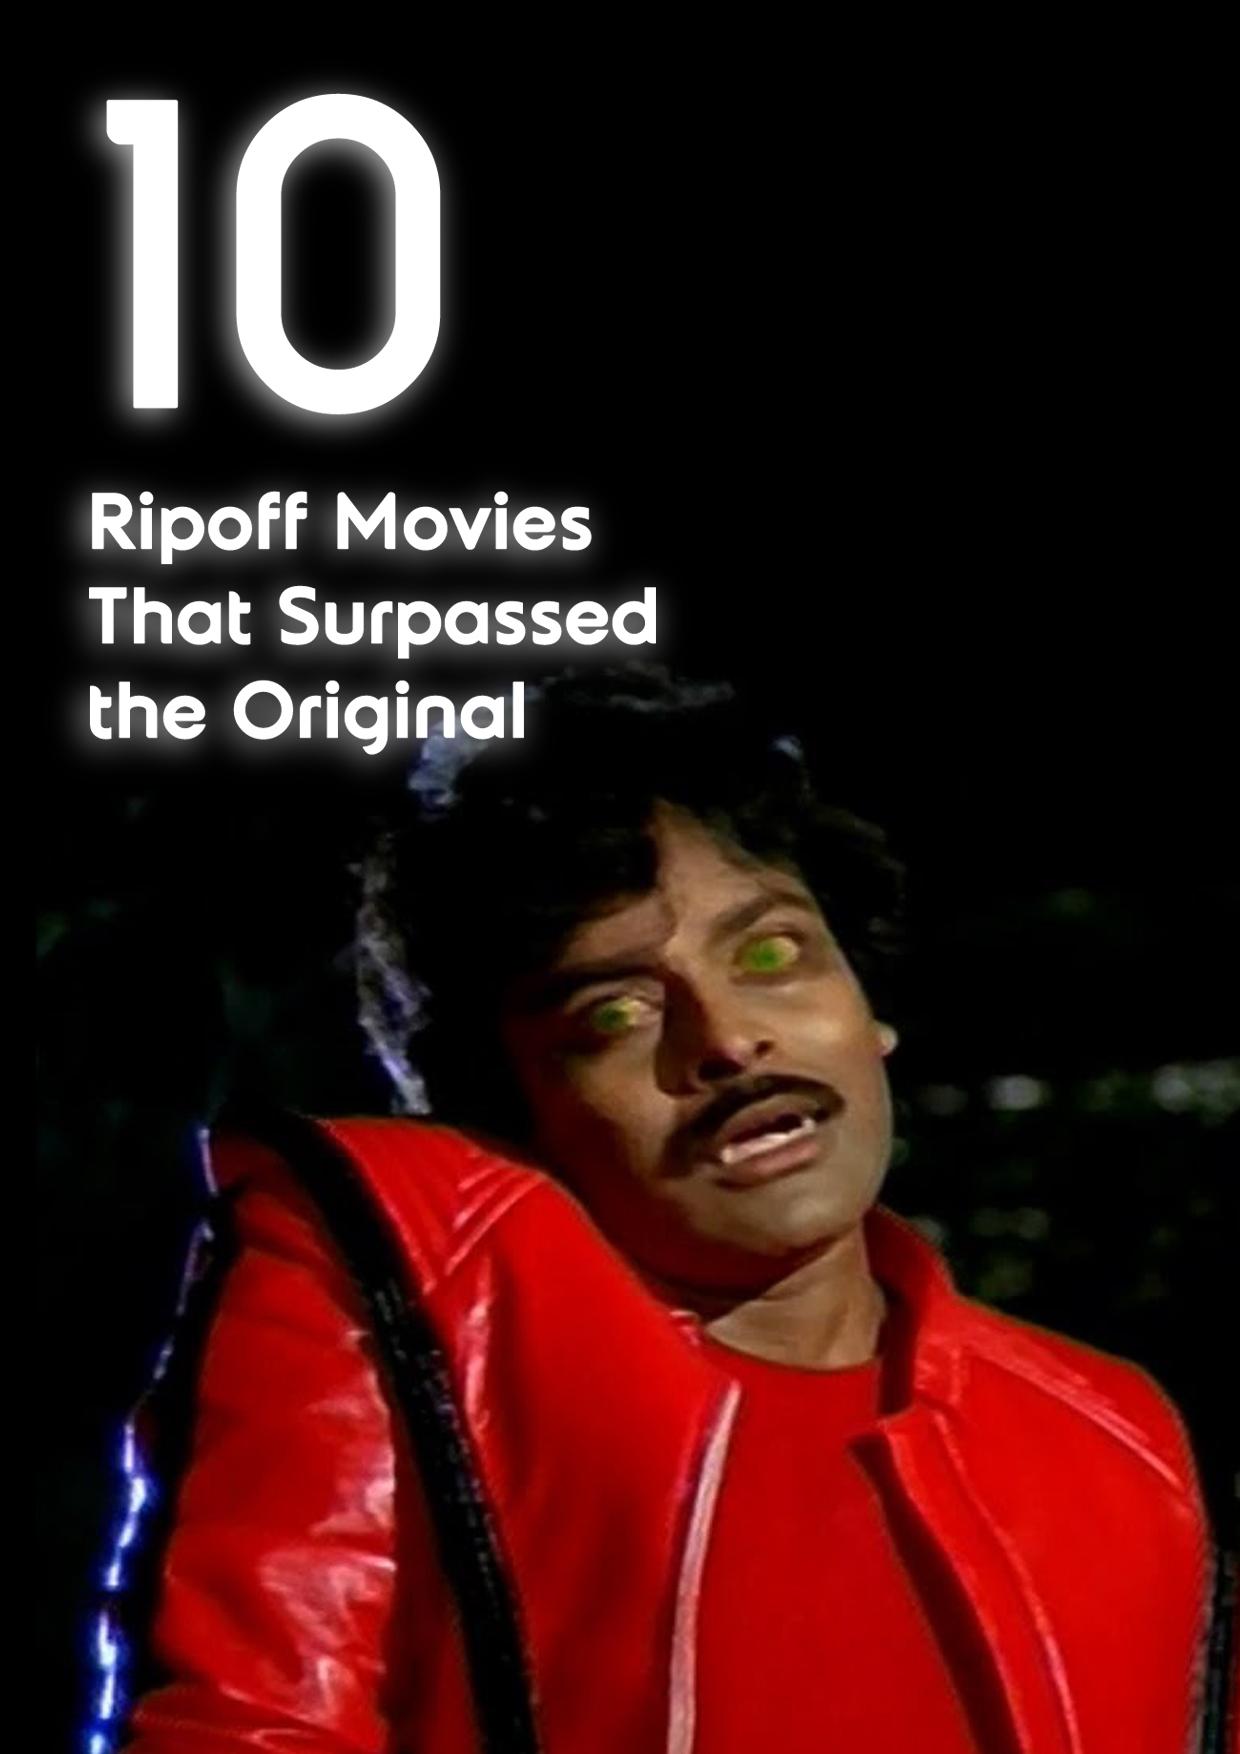 10 Ripoff Movies That Surpassed the Original